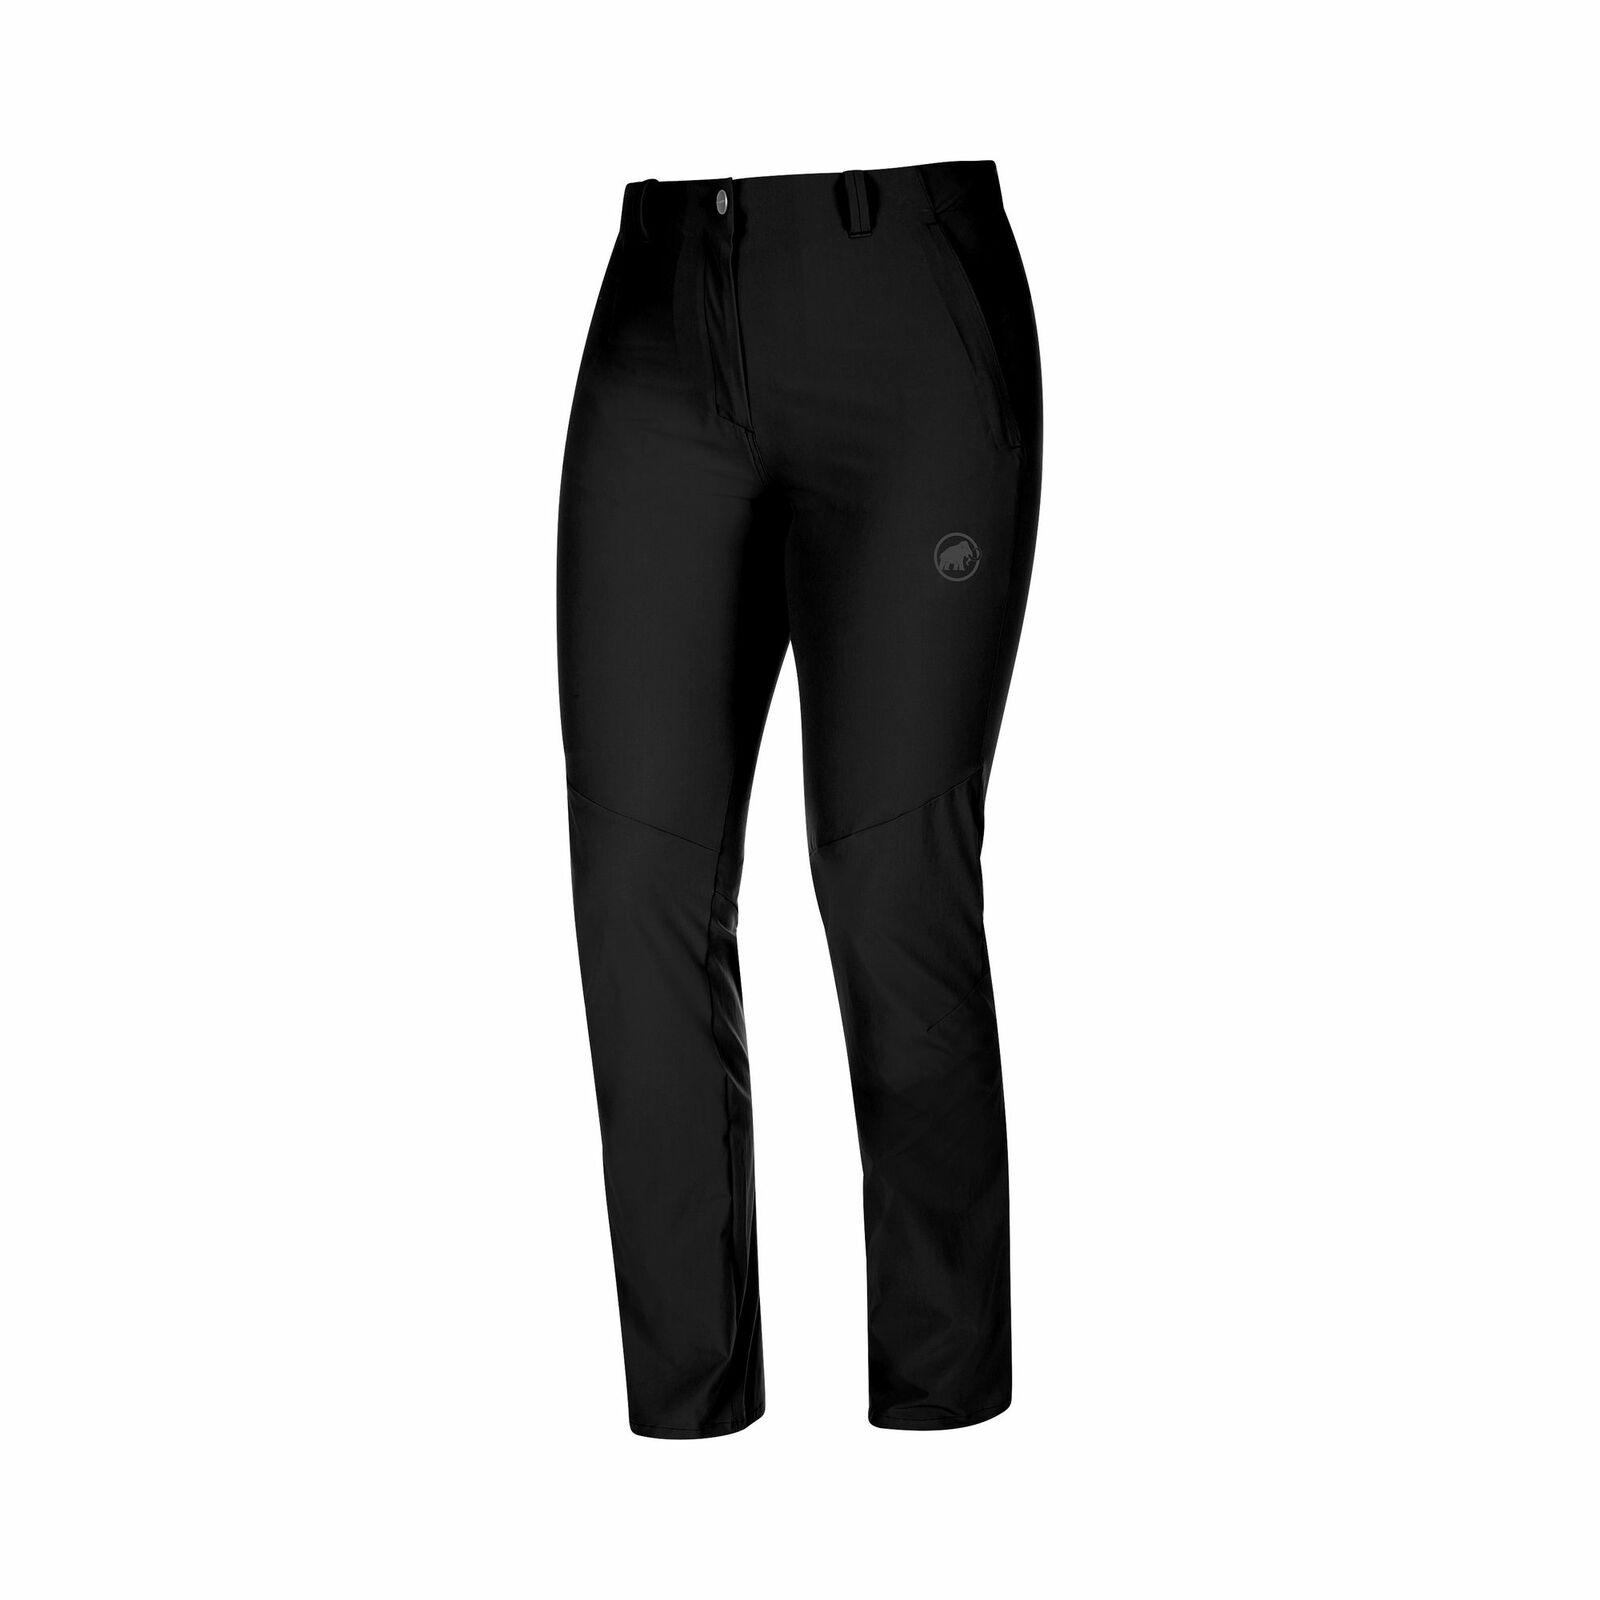 Mammut runbold Hose daSie outdoorhose Hiking Hose Leisure Trousers